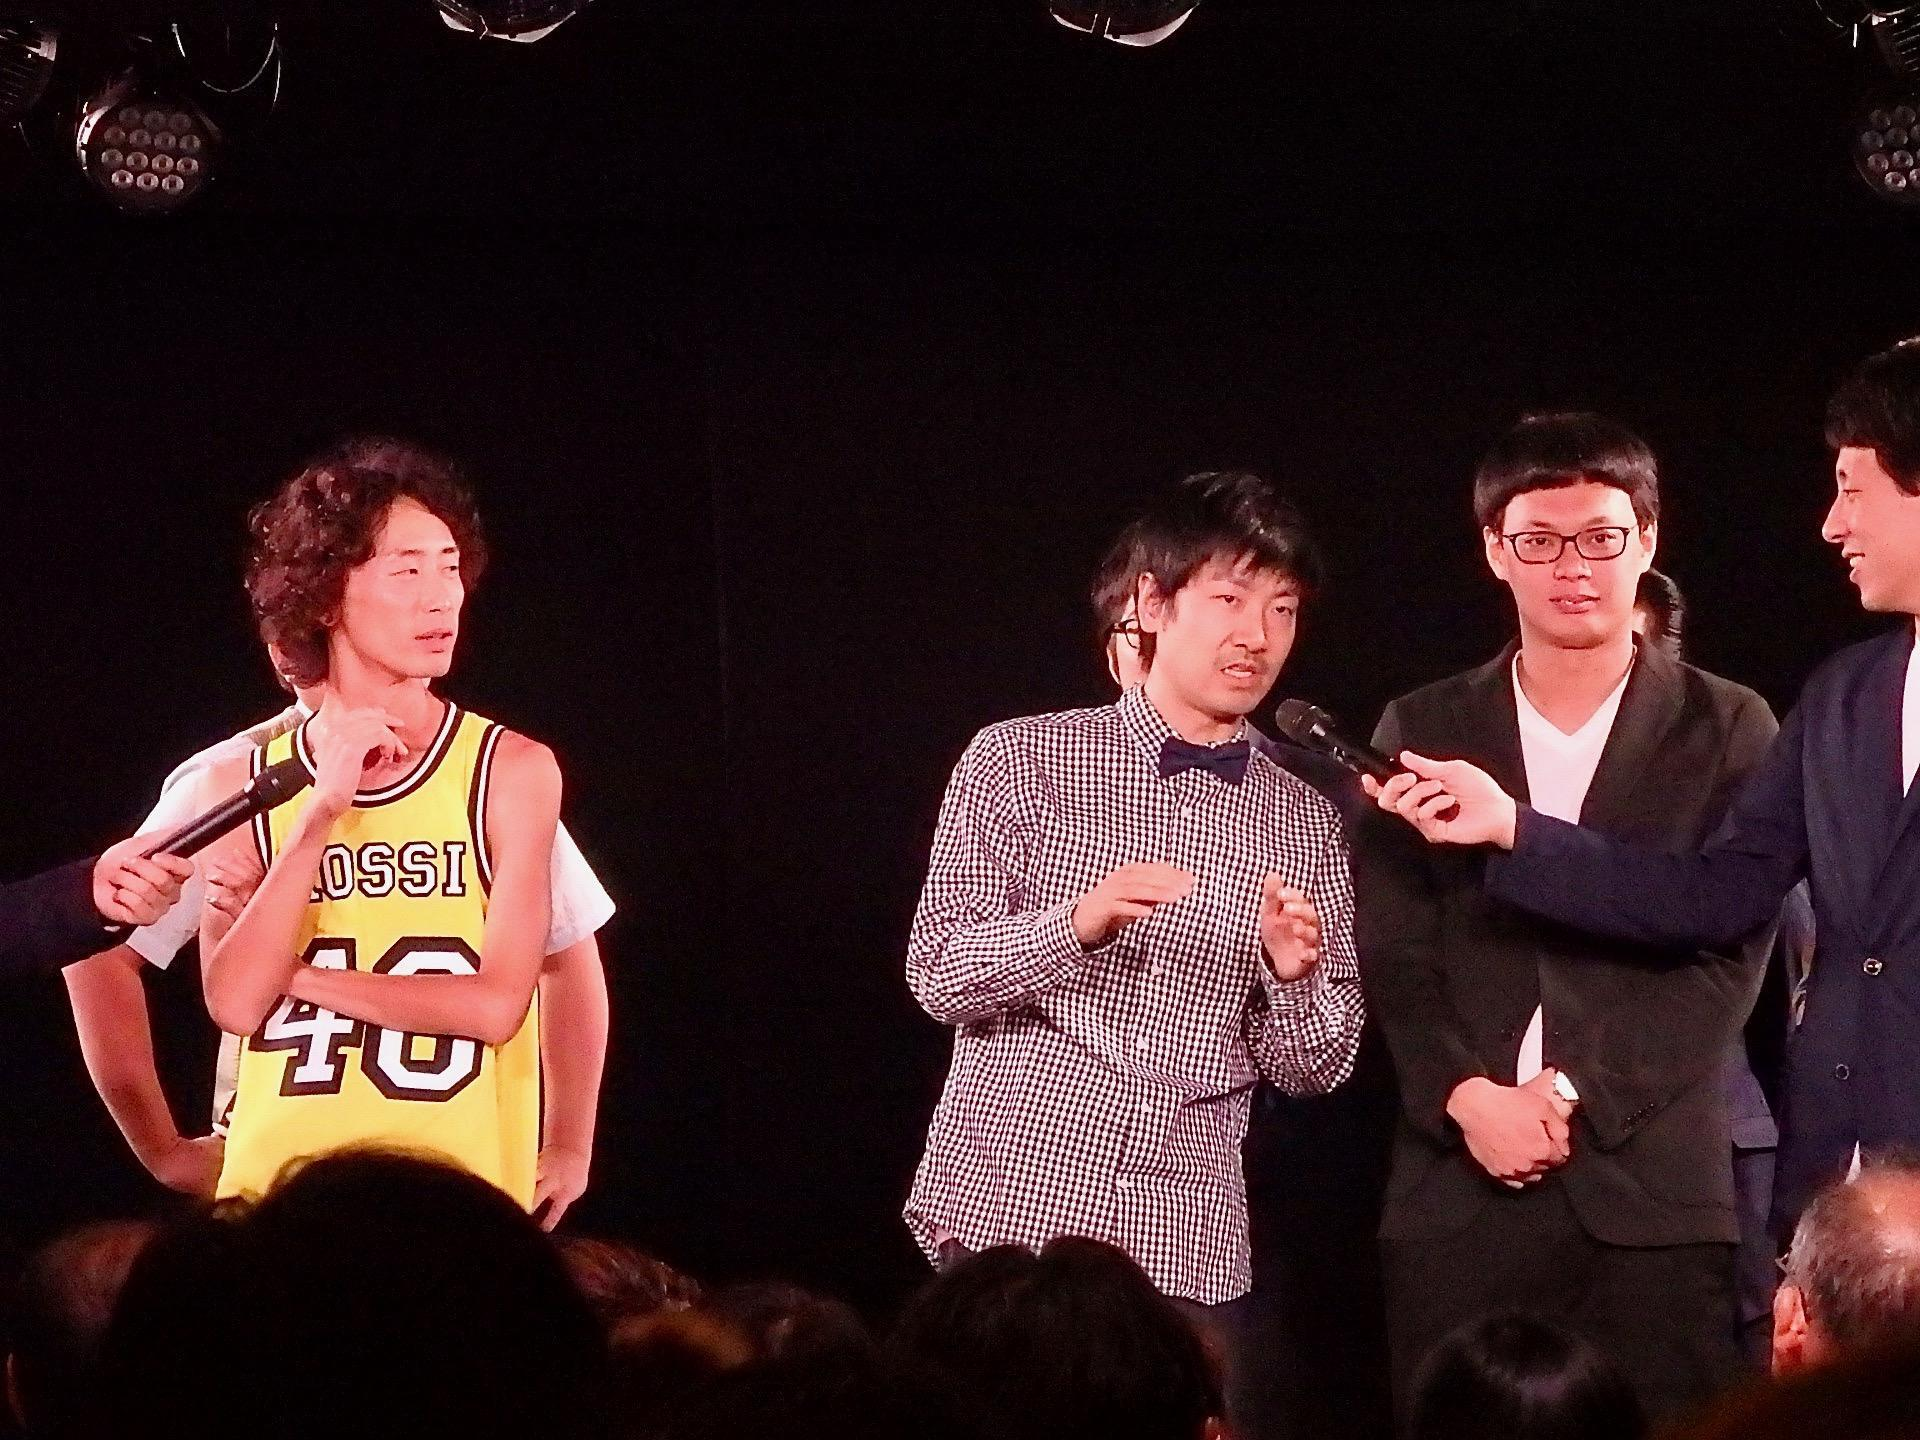 http://news.yoshimoto.co.jp/20171016142209-b6d35747a6e0406dadbf84f6d863441691113293.jpg